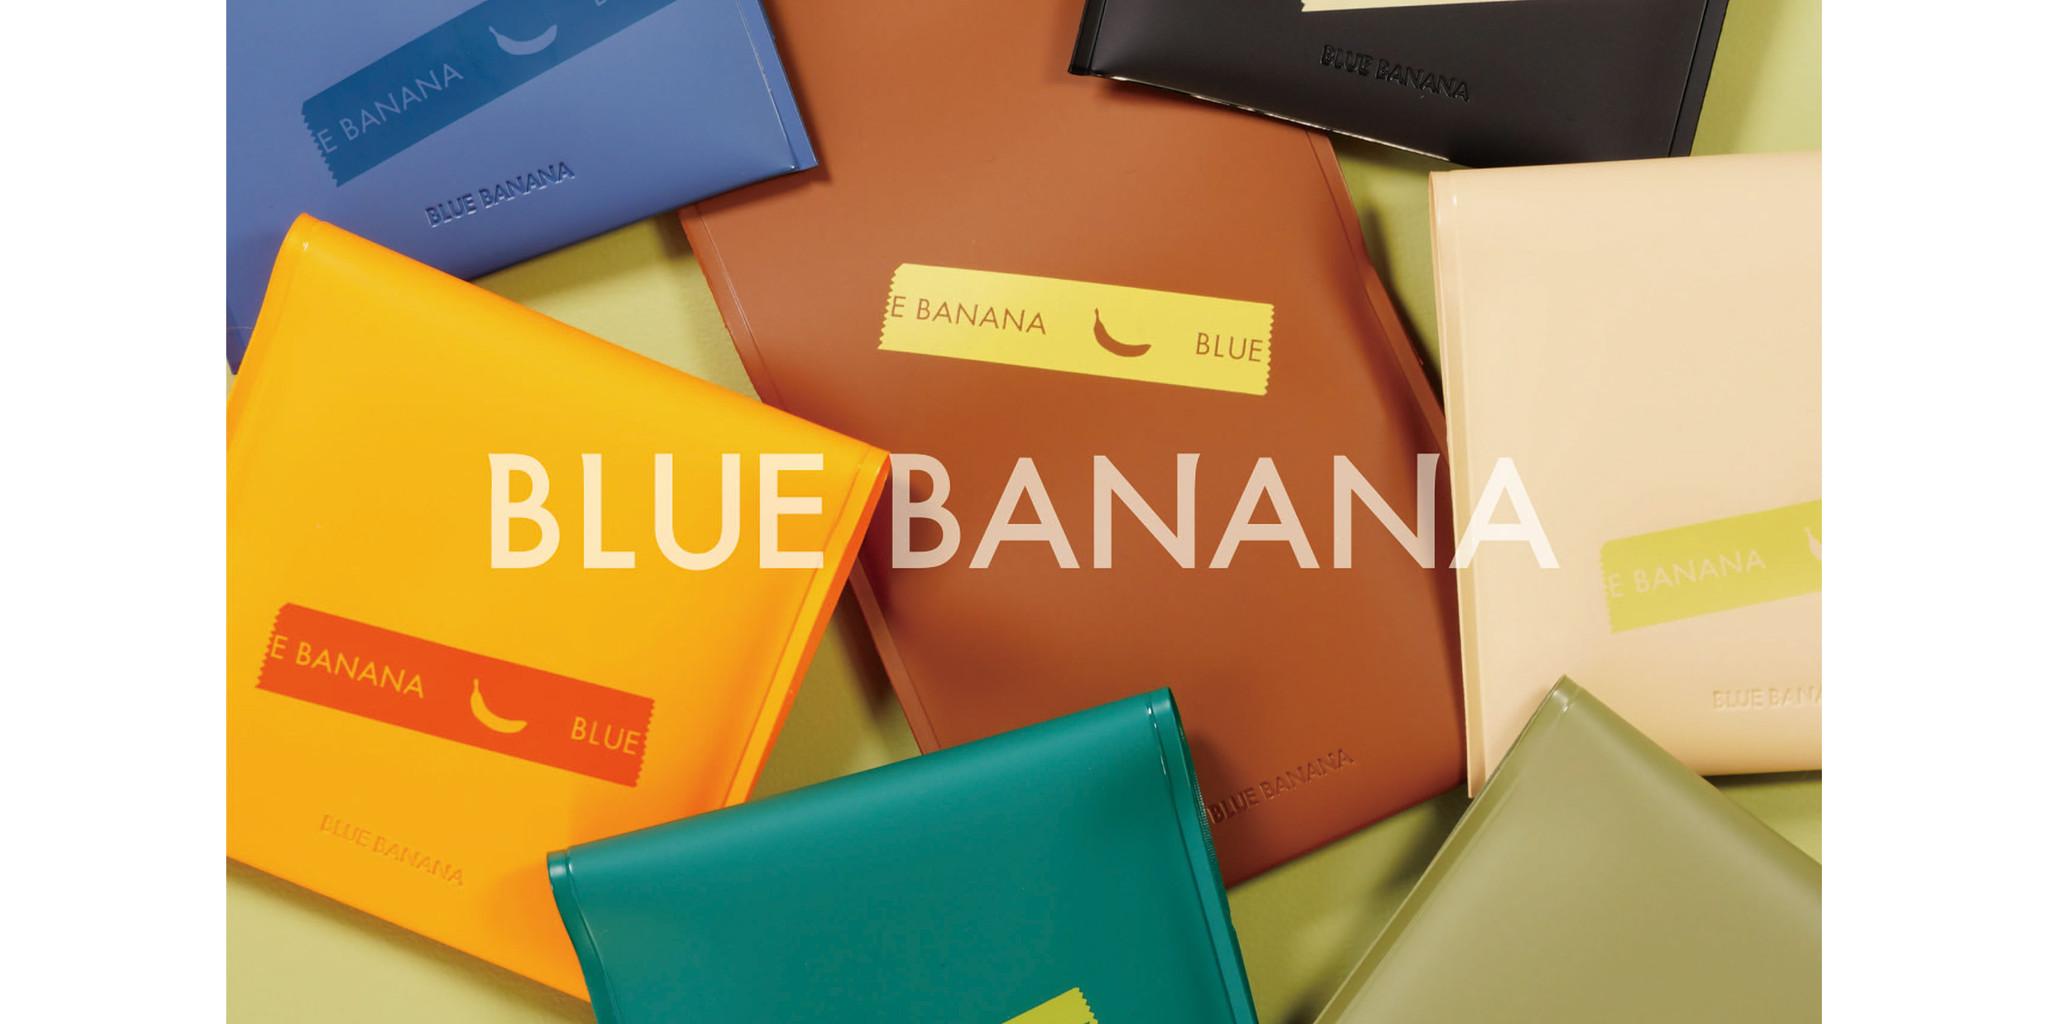 BLUE BANANA(ブルーバナナ)公式通販サイト パスケース・財布・サイフ・カードケース・マルチケース ビニール素材